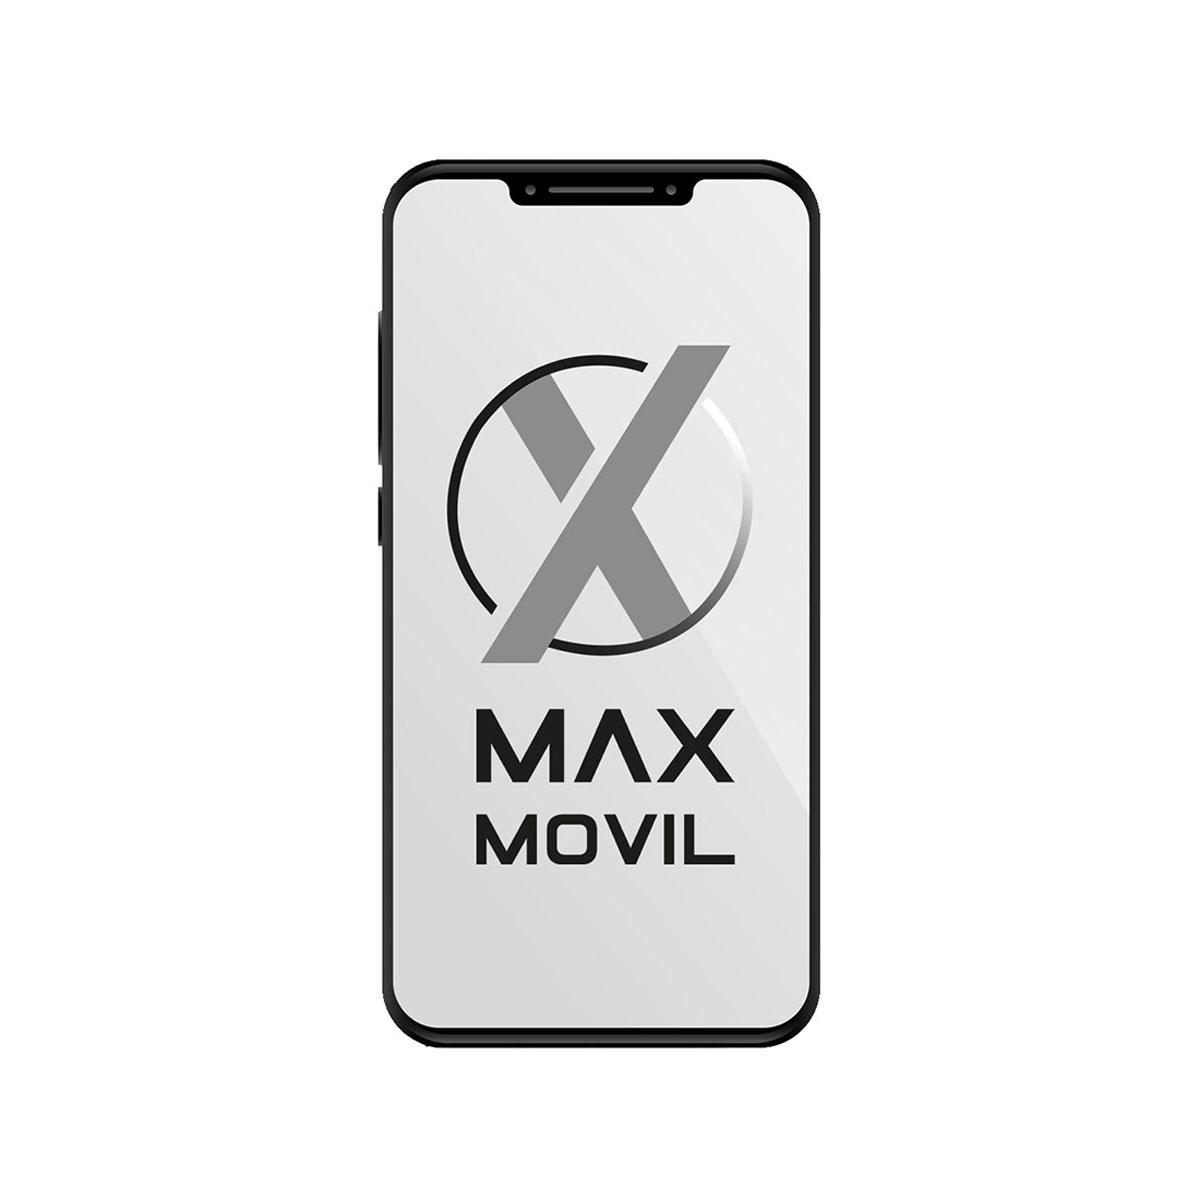 Funda Smart Cover para iPad mini 4 Roja MKLY2ZM/A